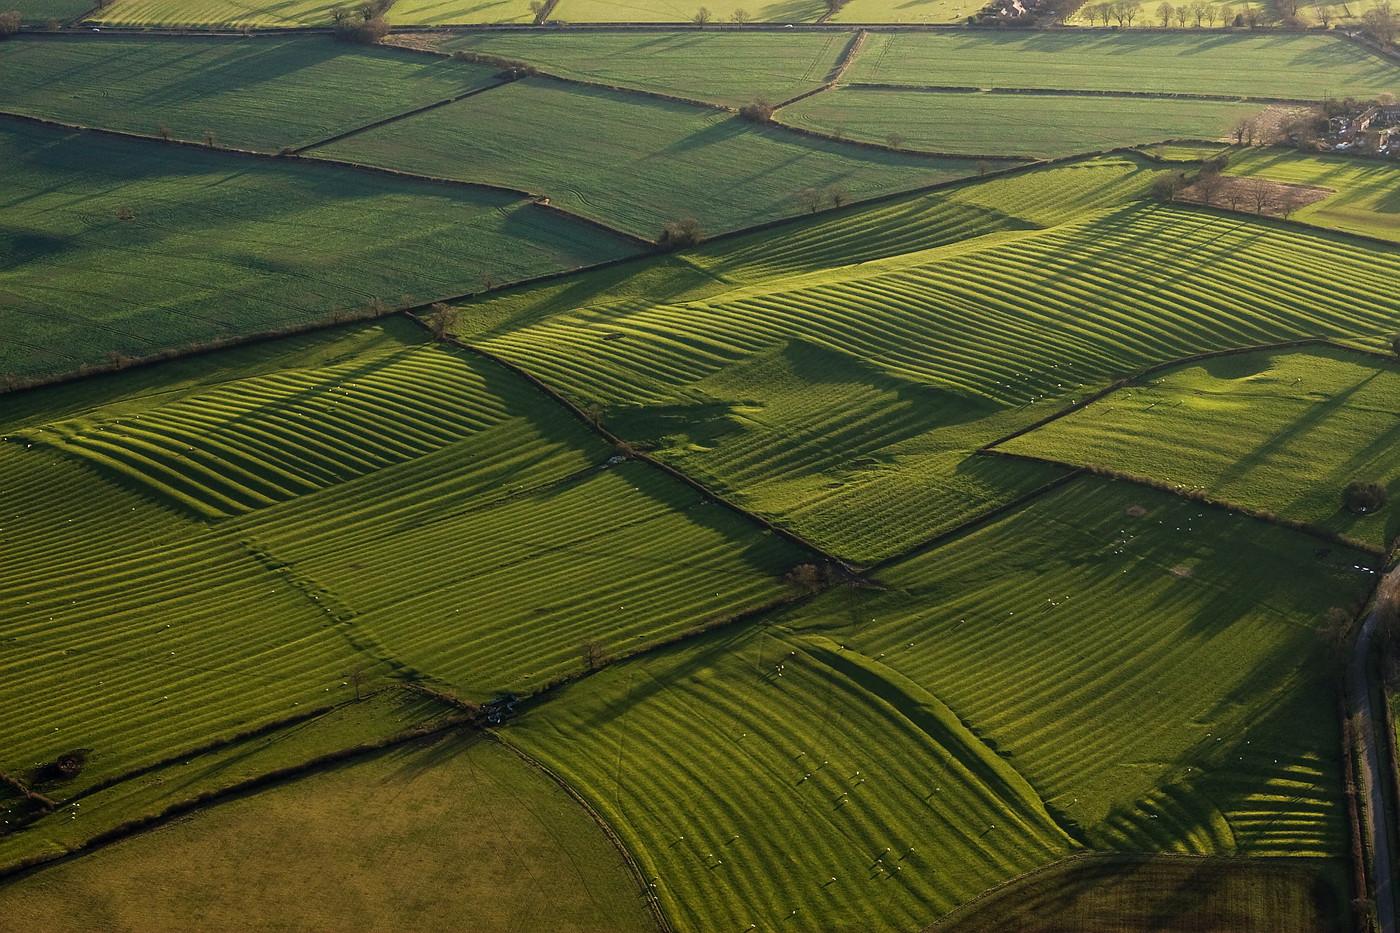 Medieval Strip Farming